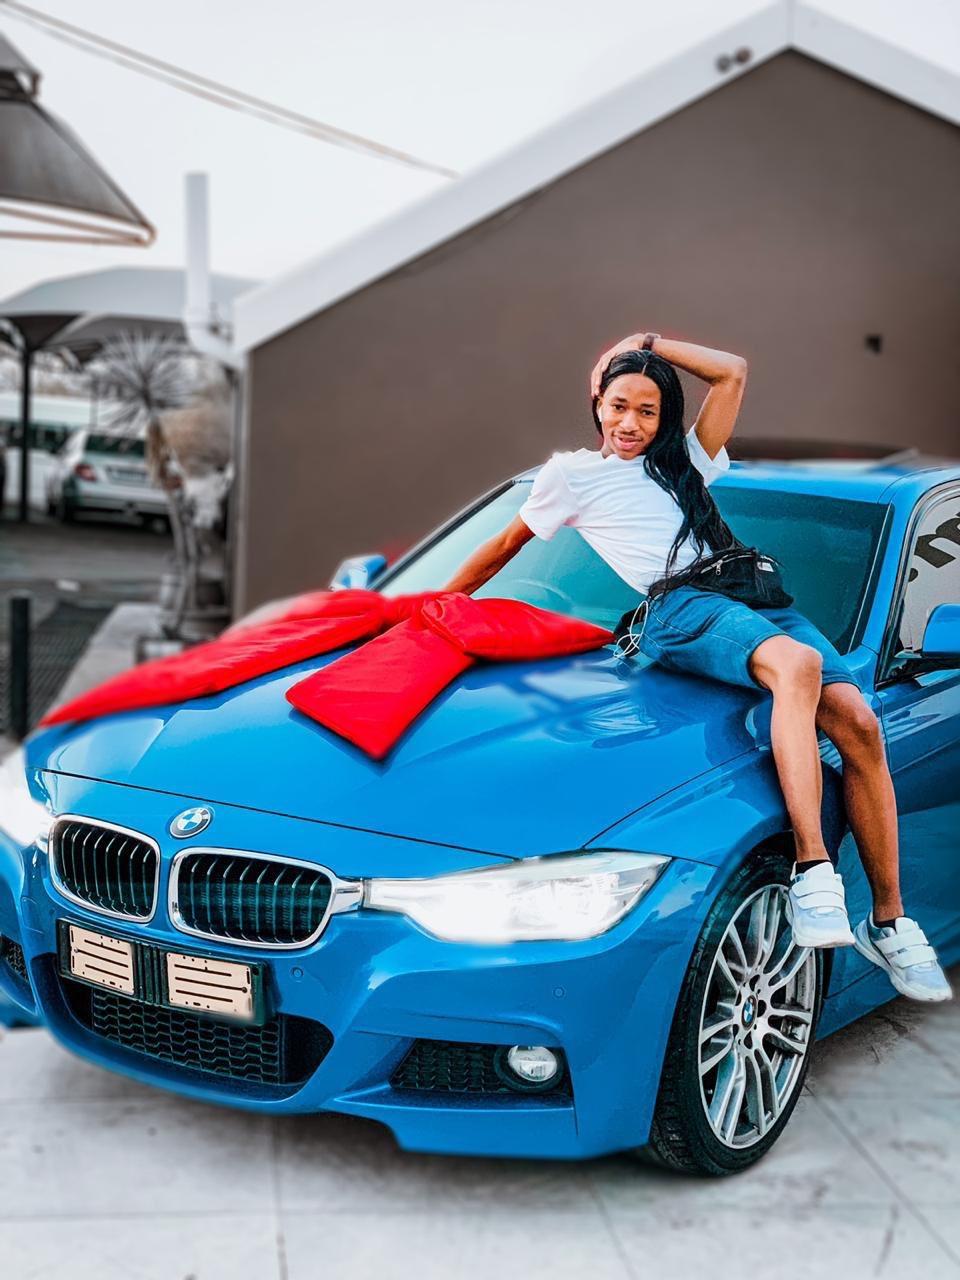 New Wheels Alert! Lasizwe Blesses Himself With A New BMW Car - OkMzansi